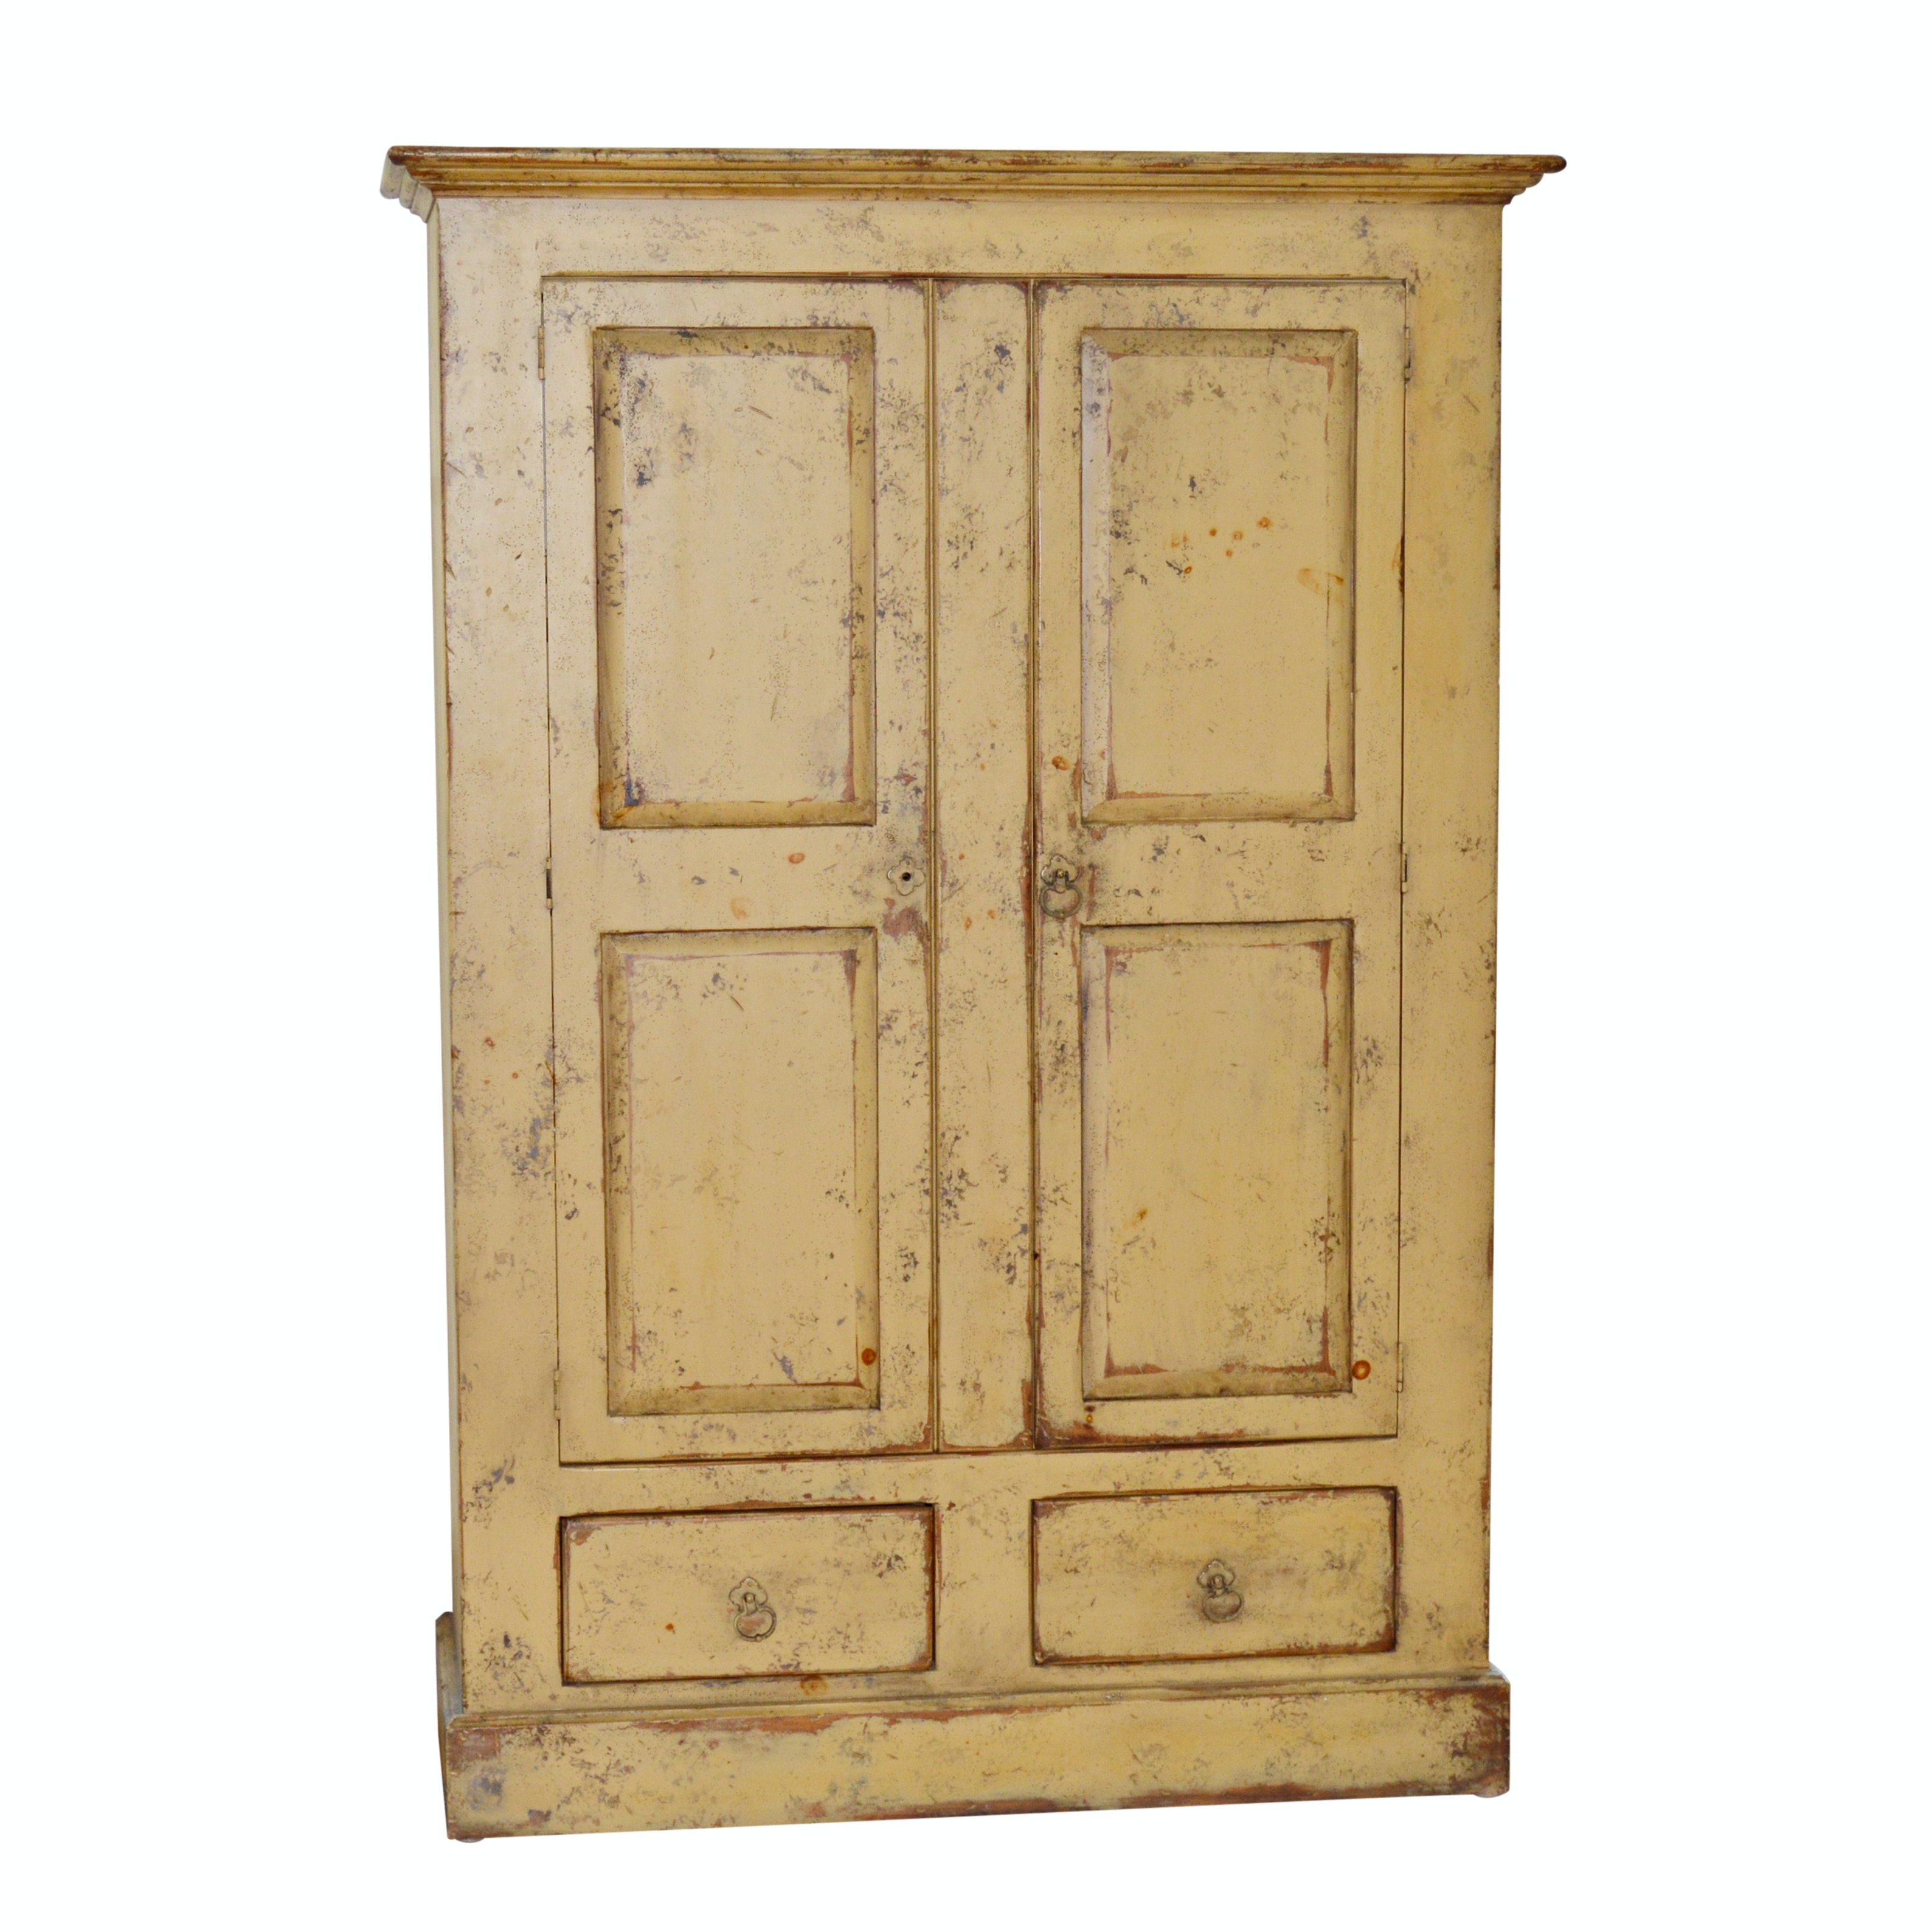 Distressed Painted Wood Cabinet by Habersham Plantation, 21st Century